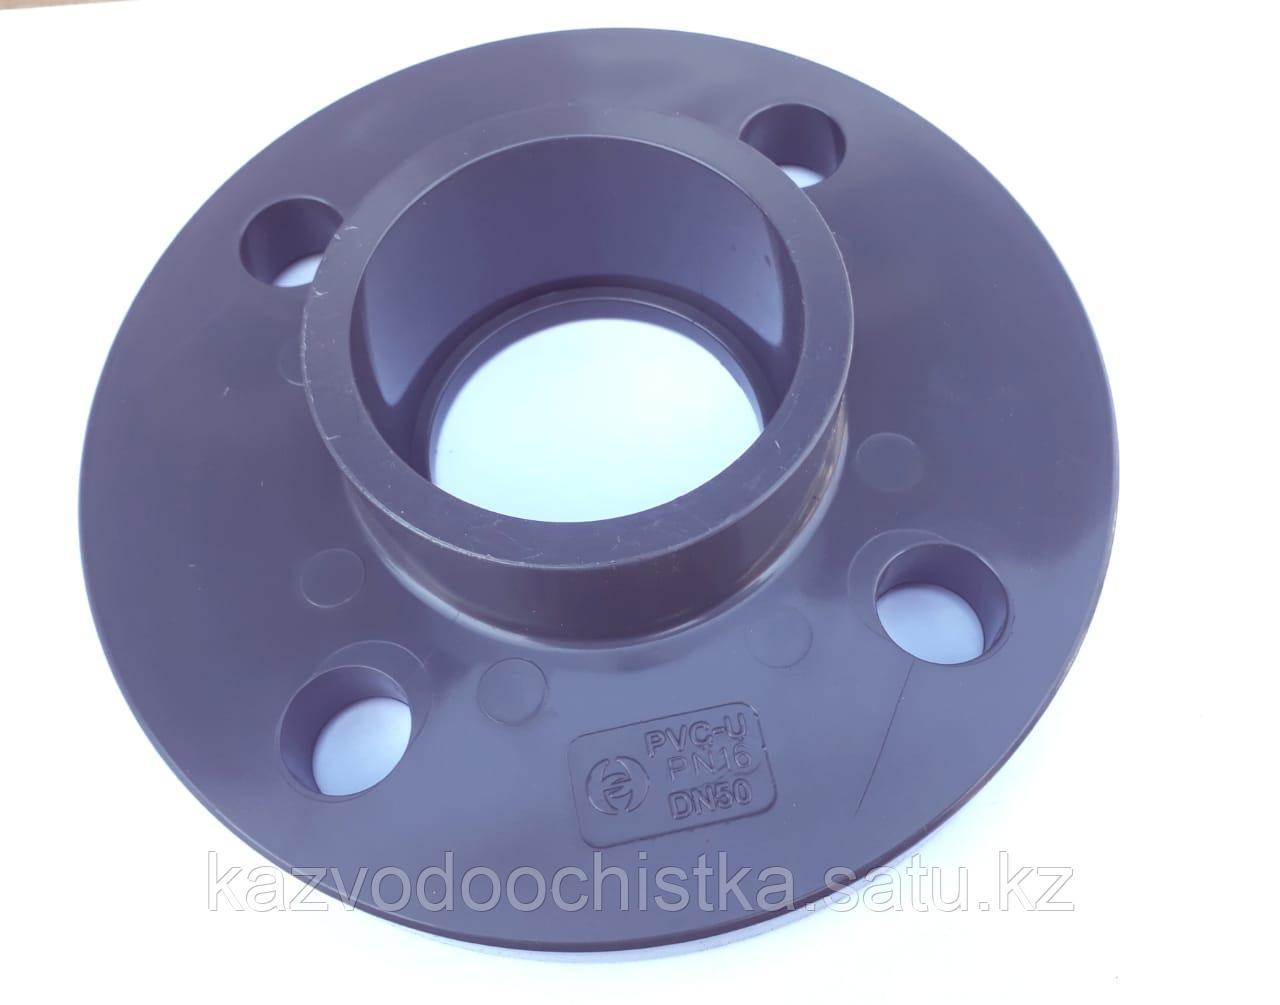 ПВХ Фланец (one piece flange PVC) 63 мм.